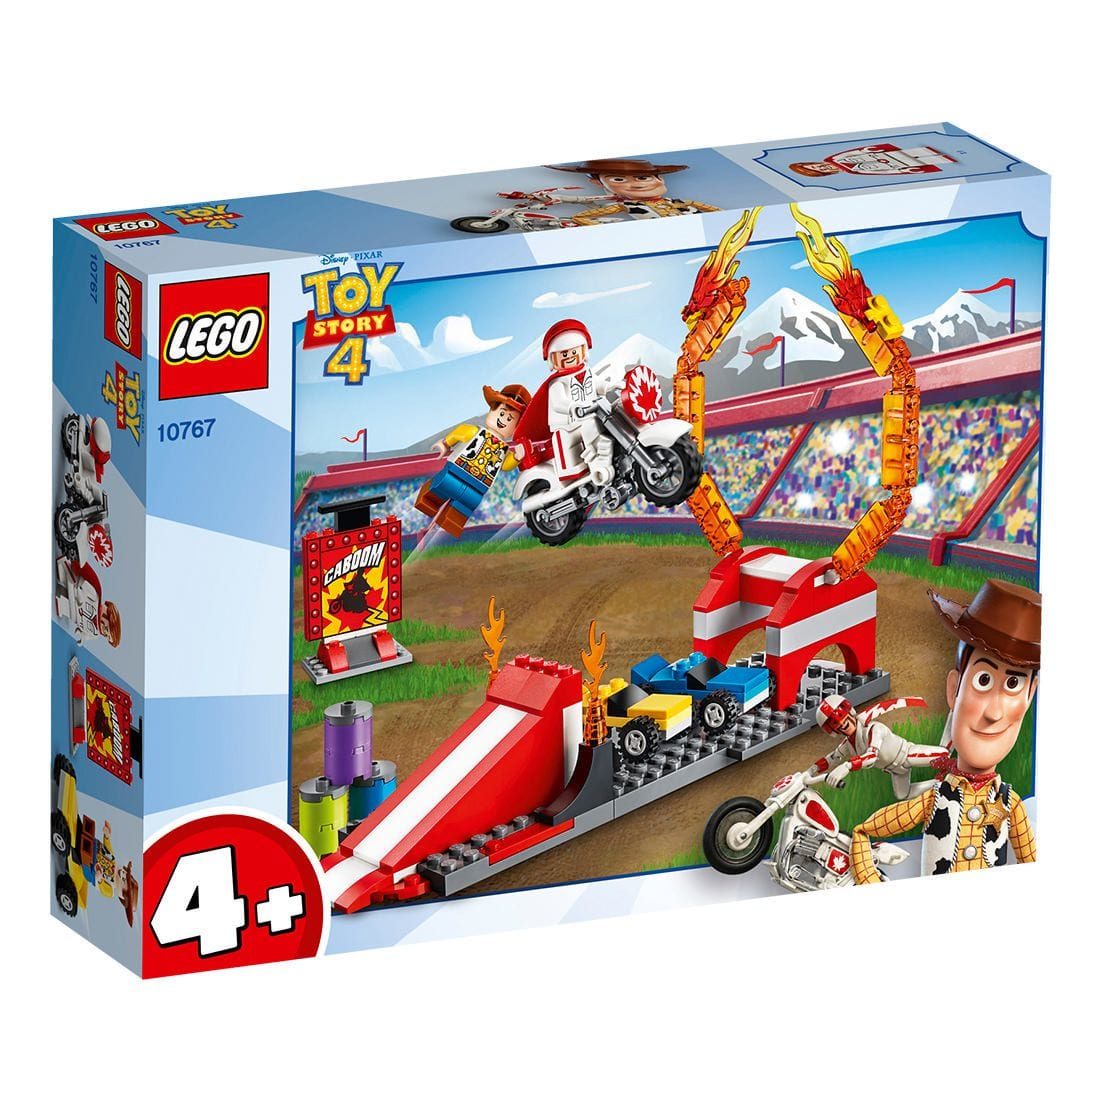 LEGO 10767 LE ACROBAZIE DI DUKE CABOOM TOY STORY